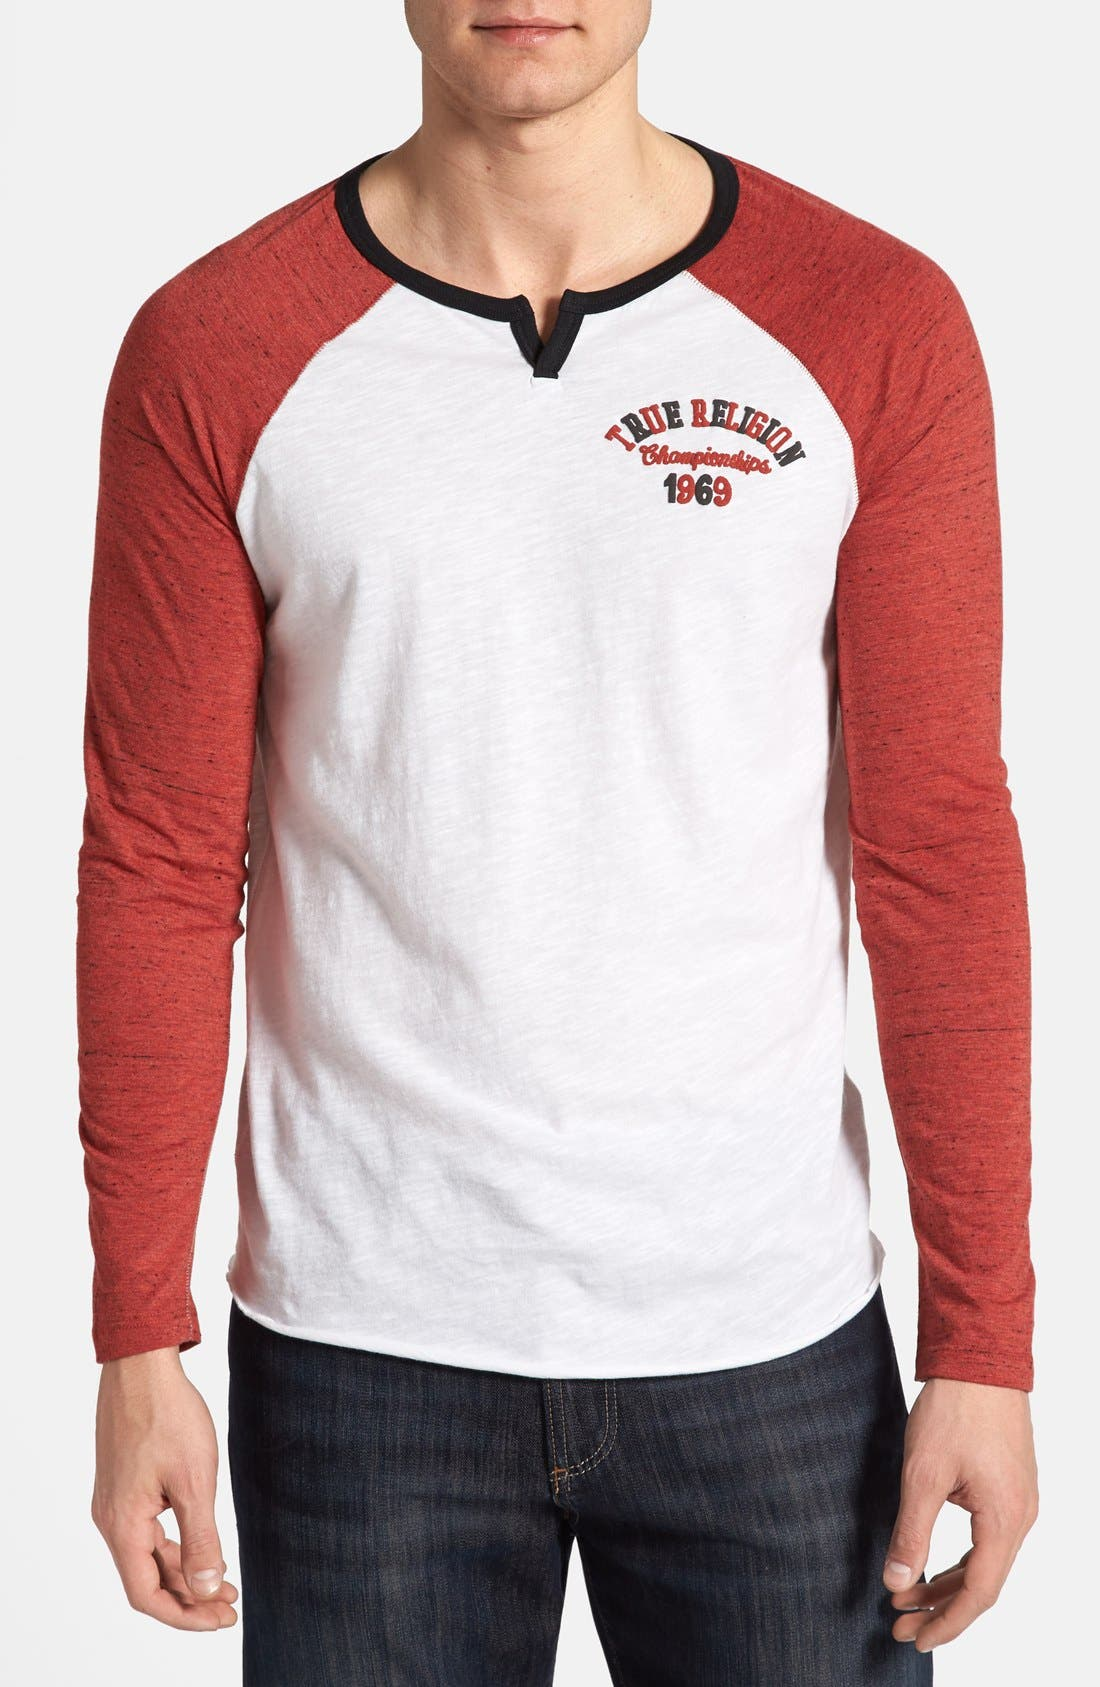 Main Image - True Religion Brand Jeans 'Champs' Raglan Sleeve T-Shirt